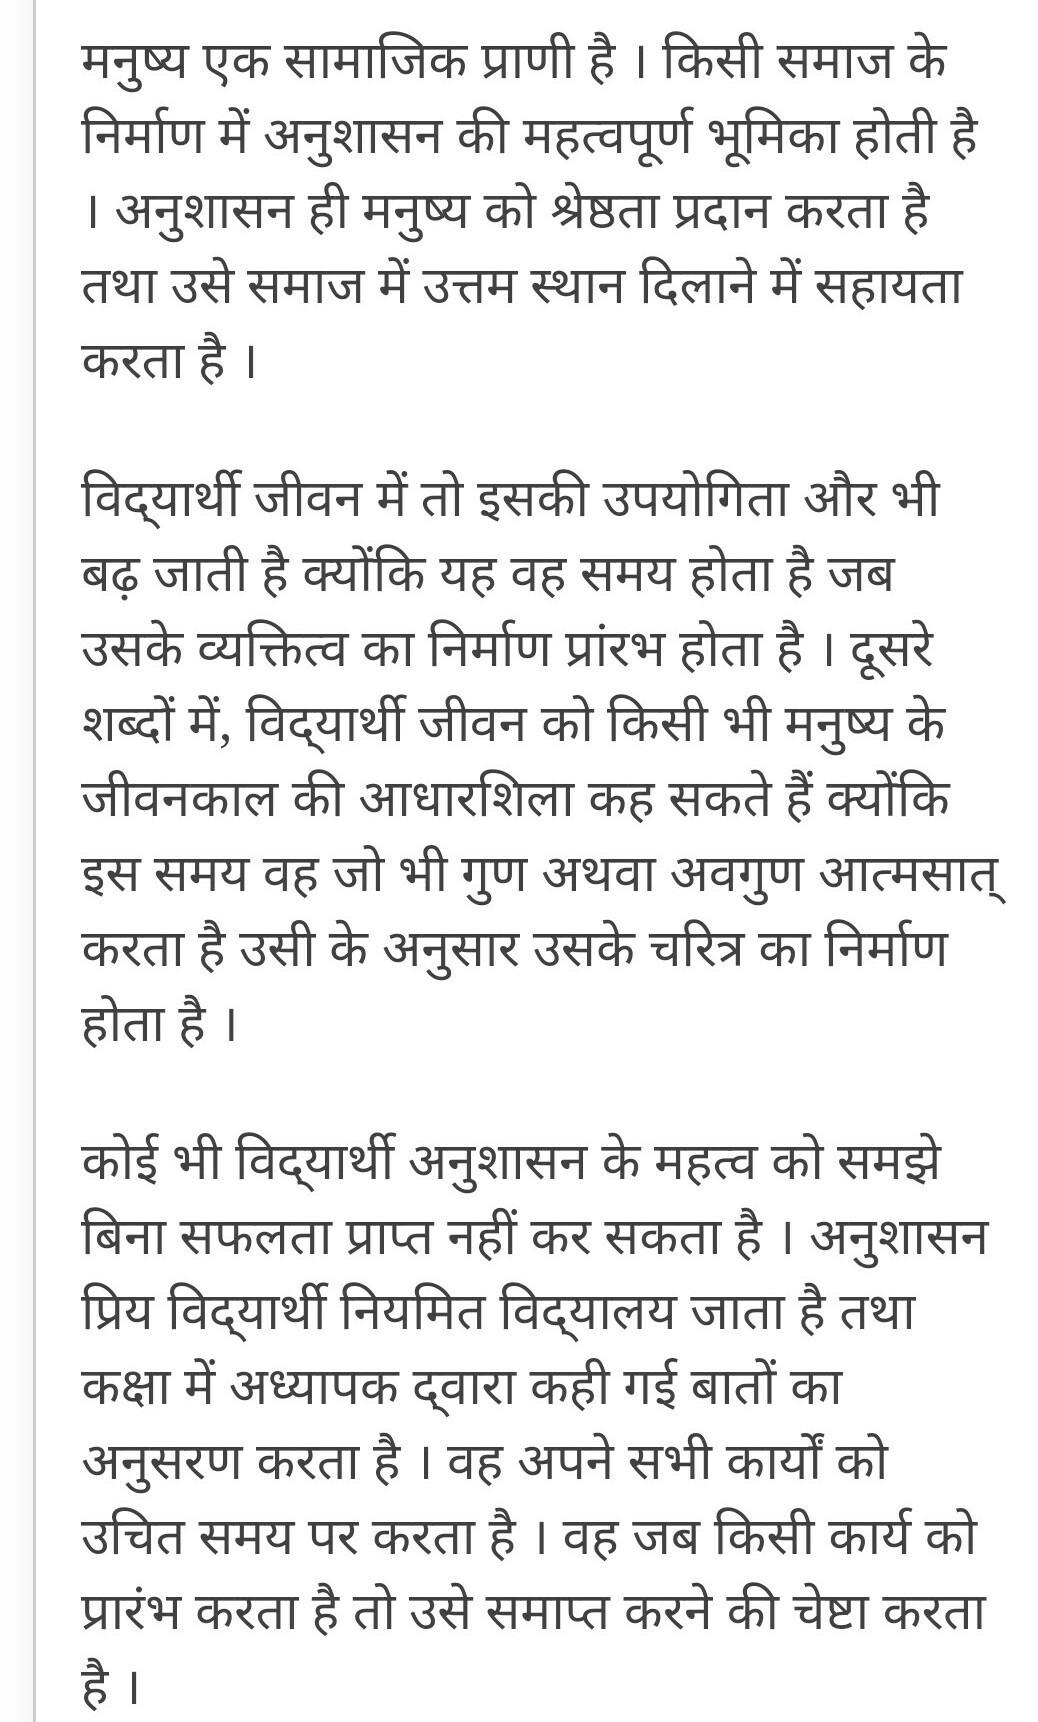 essay on vidyarthi jeevan me anushasan ka mahatva